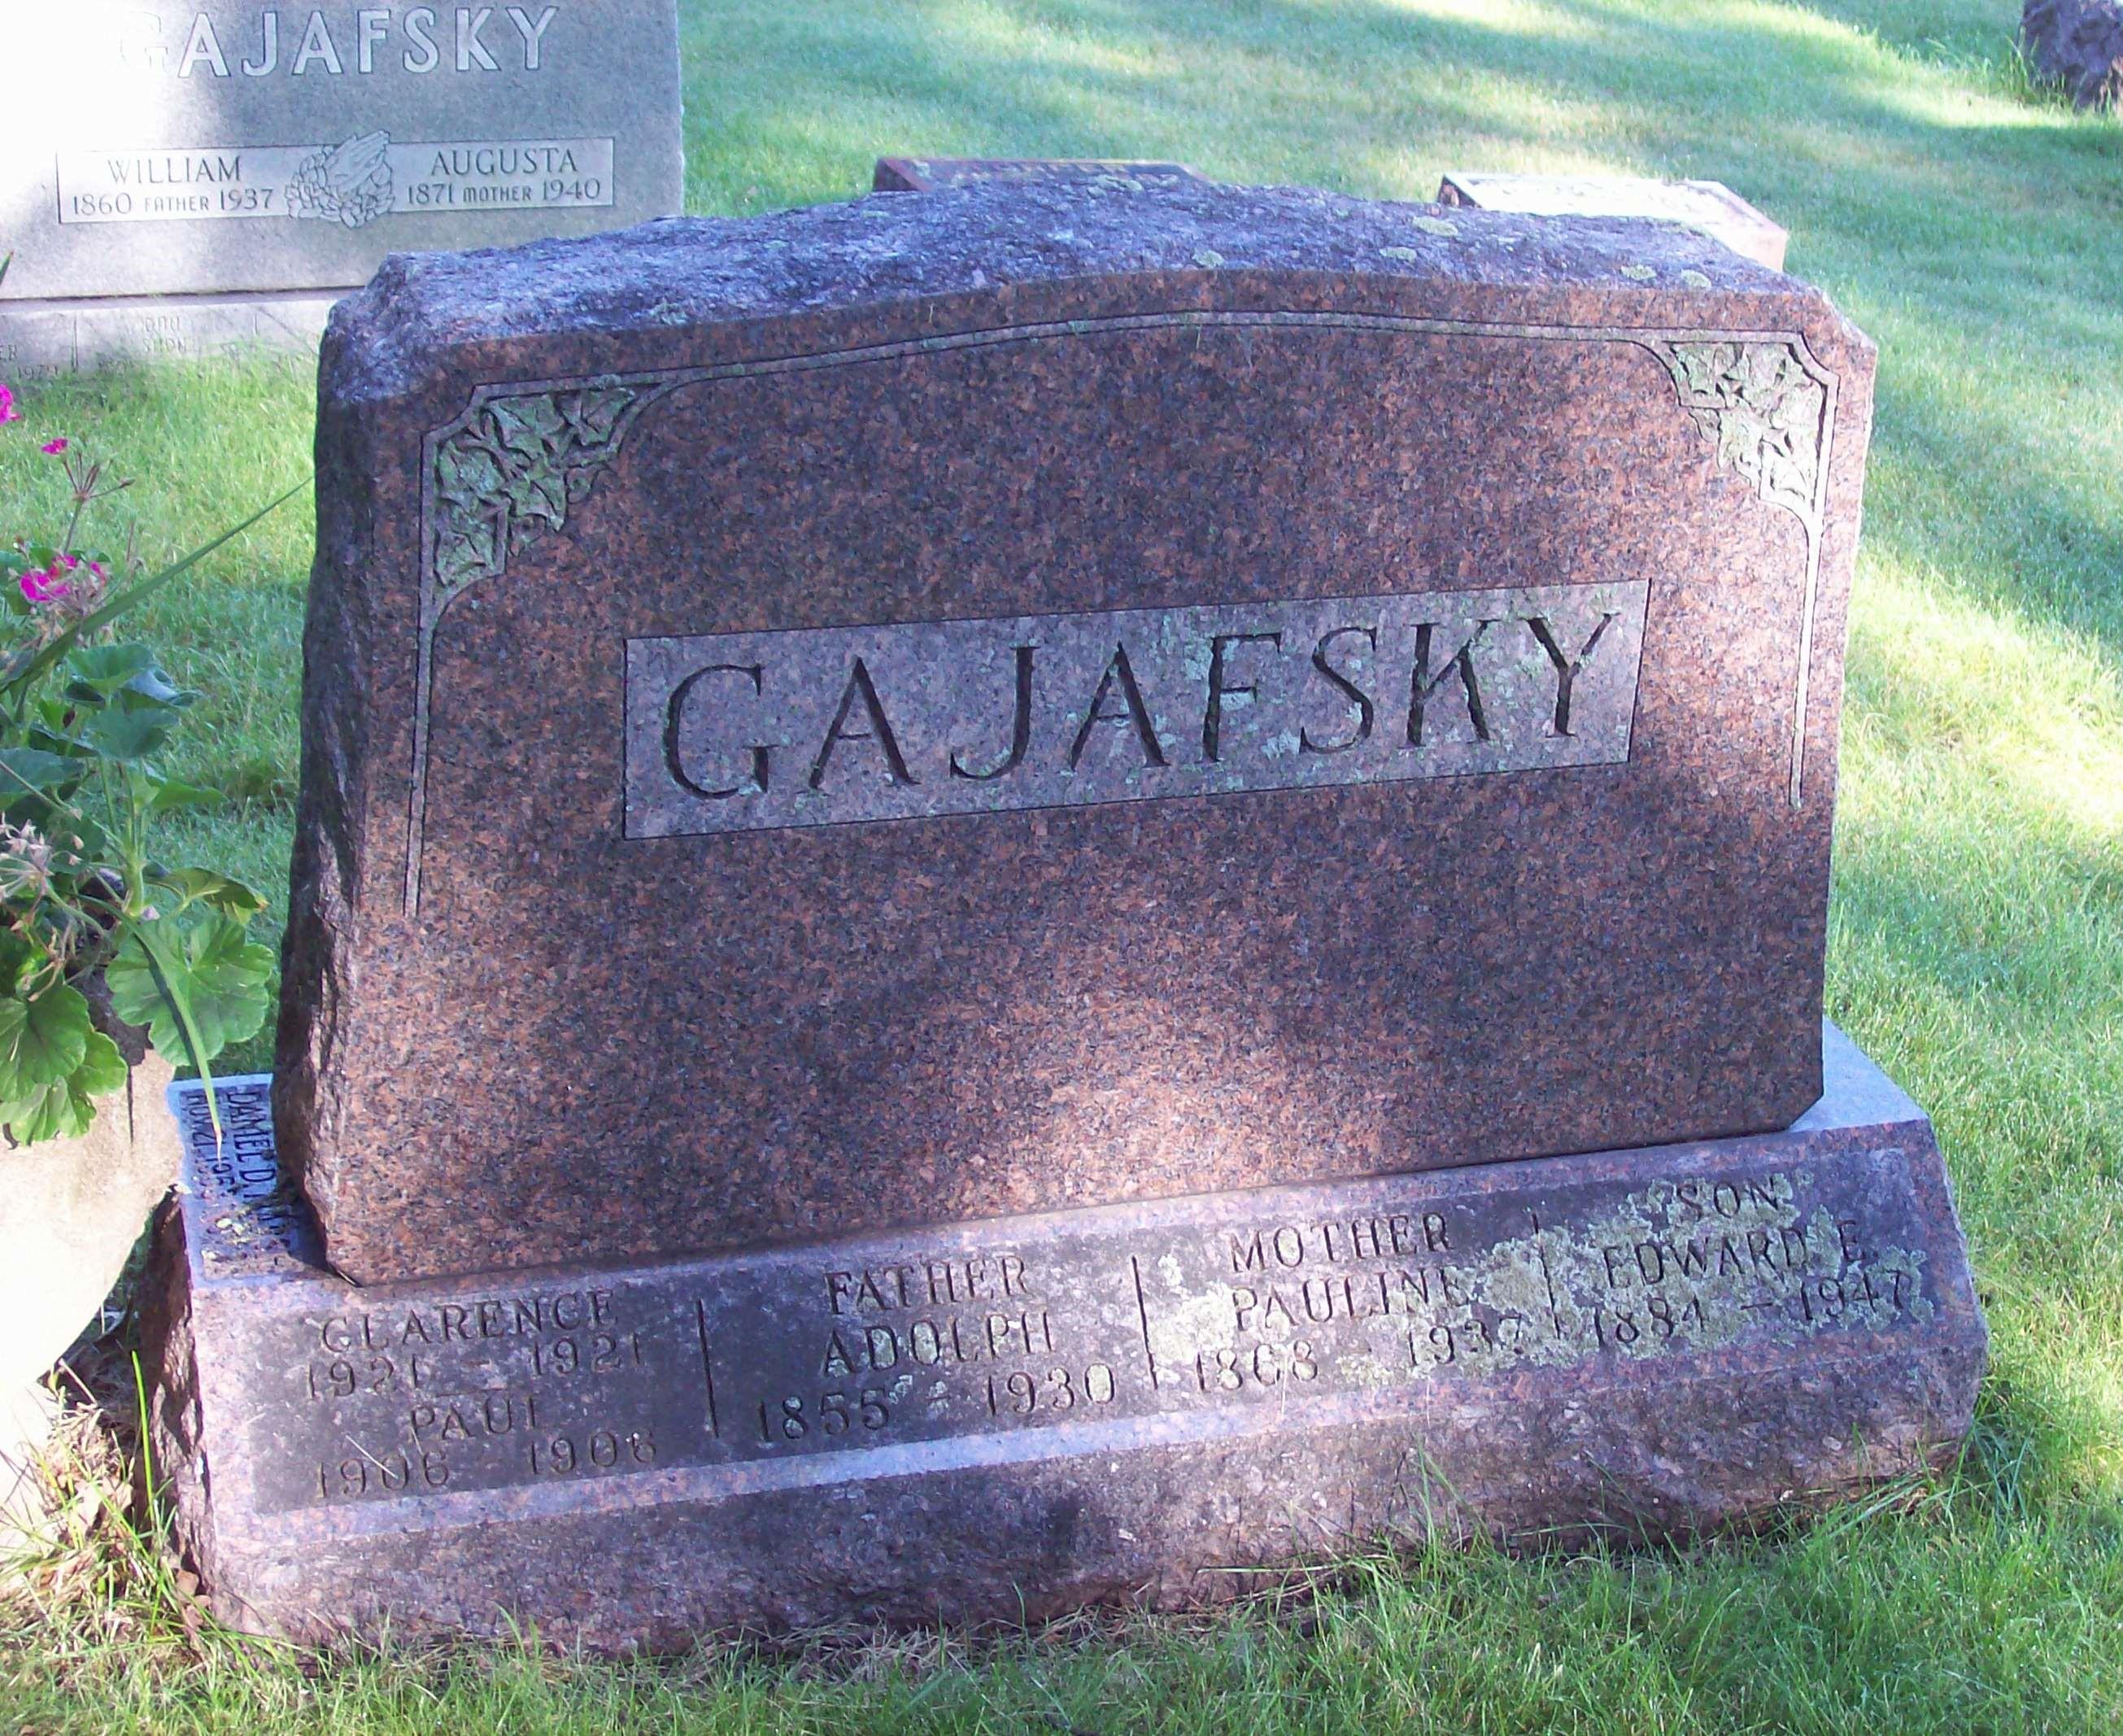 Gustav Adolph Gajafsky